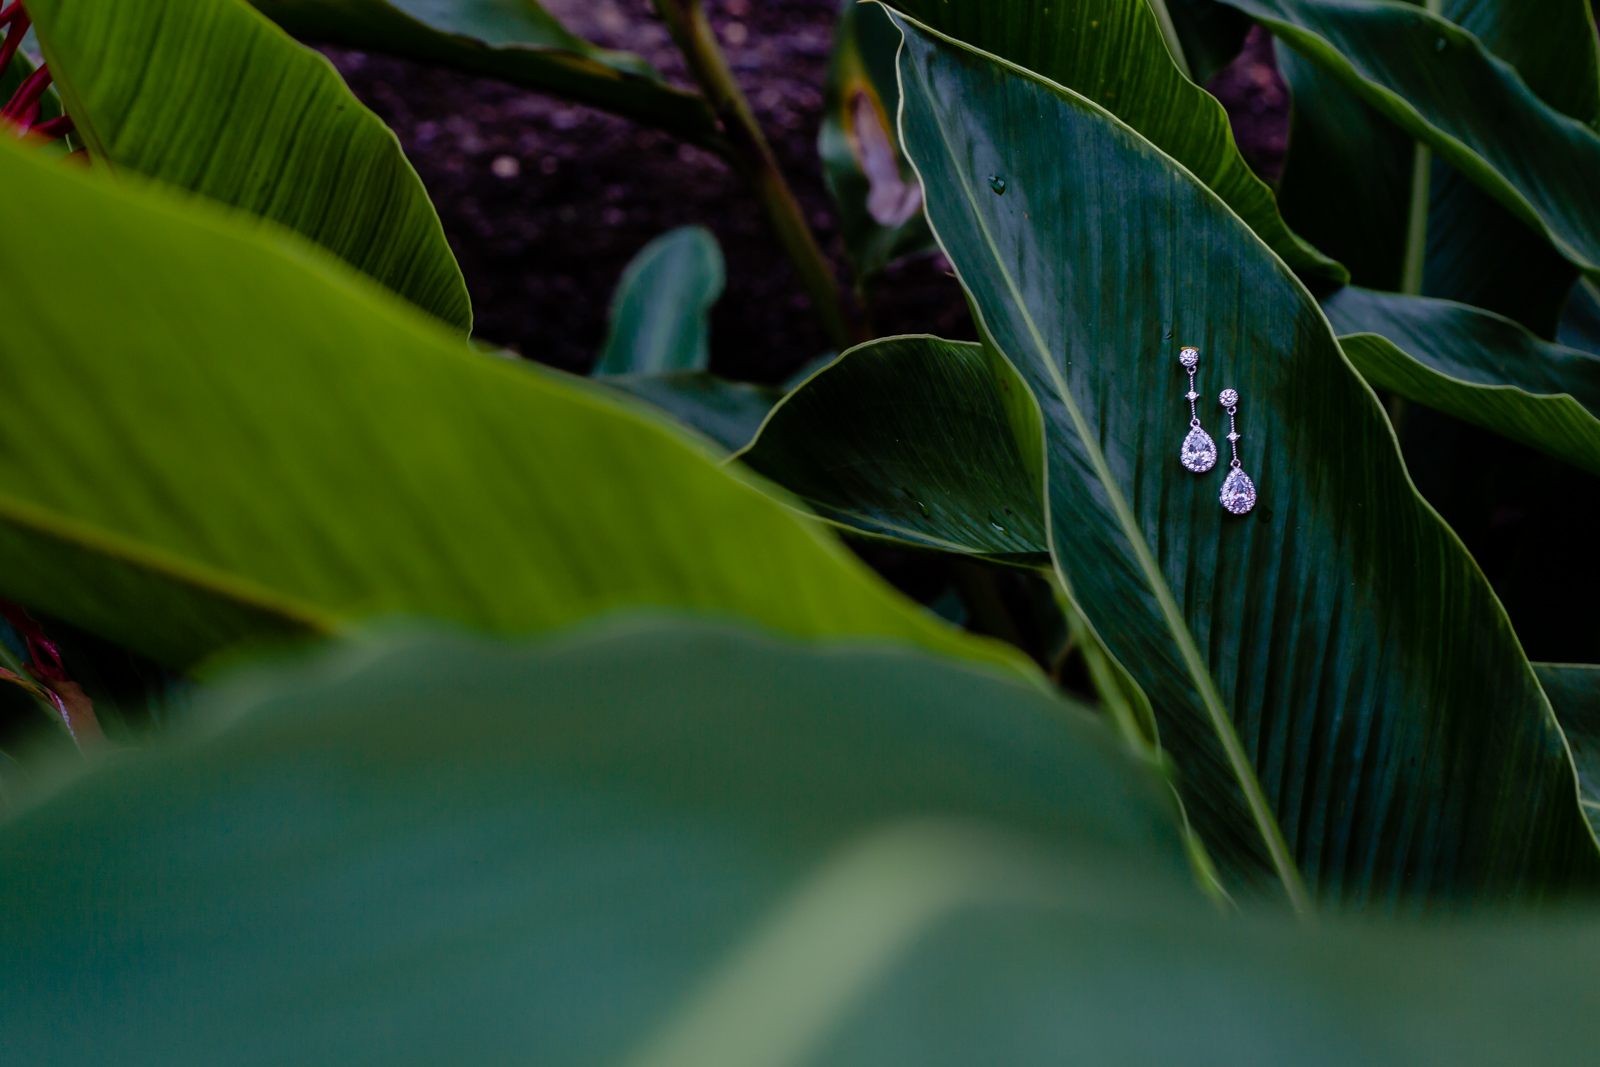 earrings on a green leaf on the garden